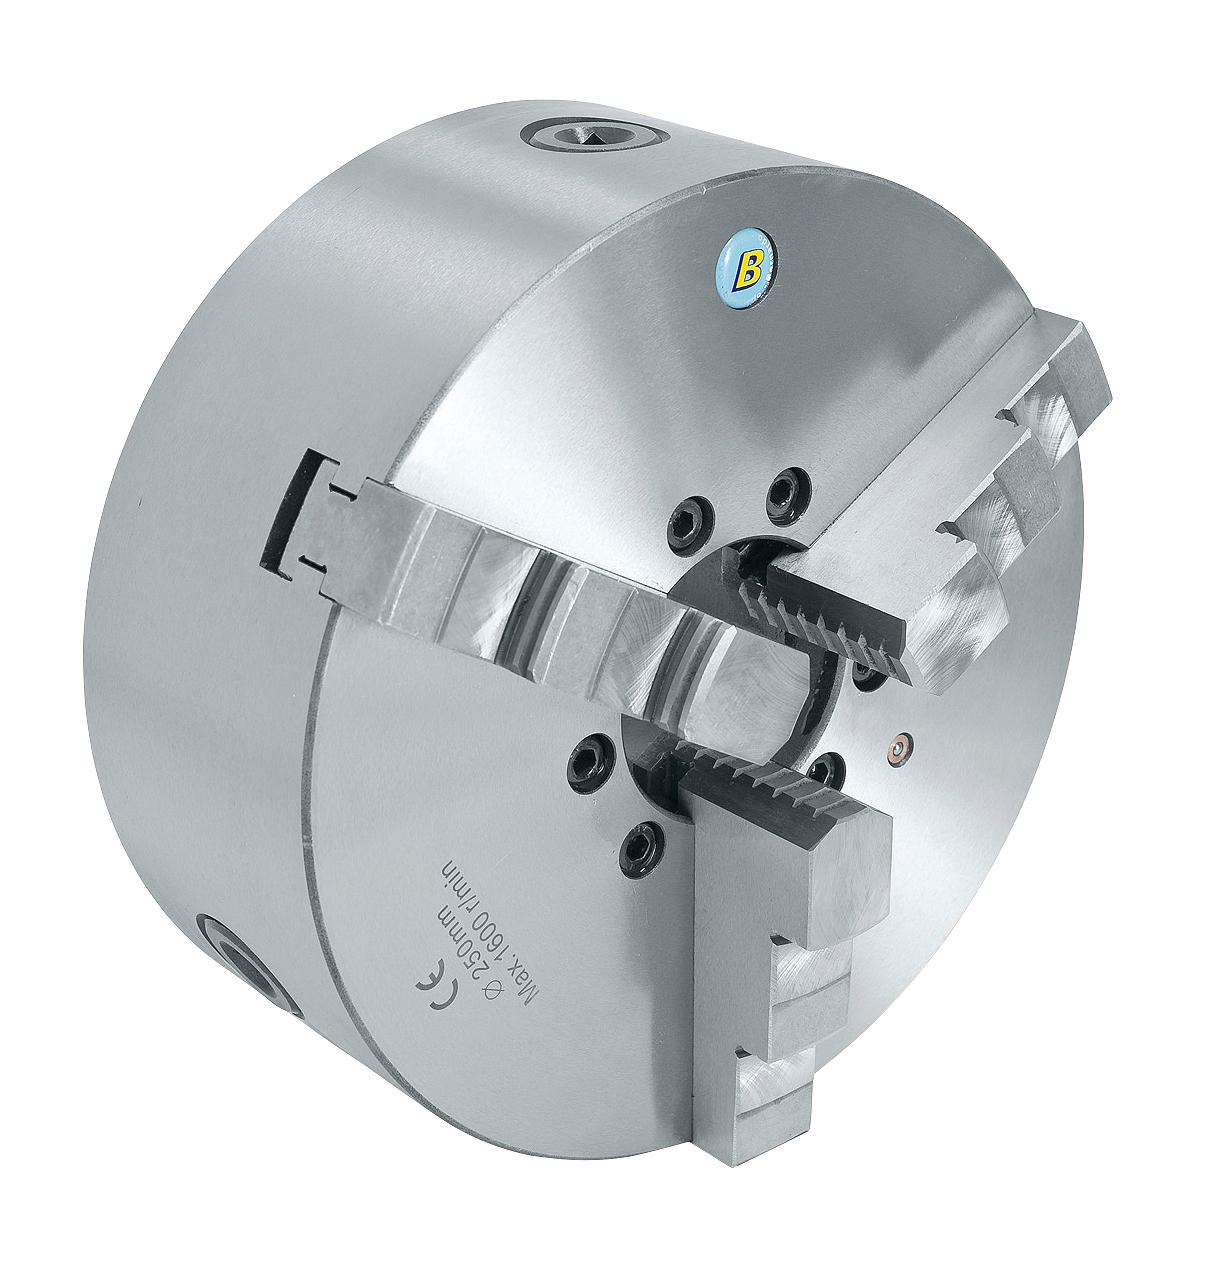 3 bakket centrerpatron standard K11-125/D4